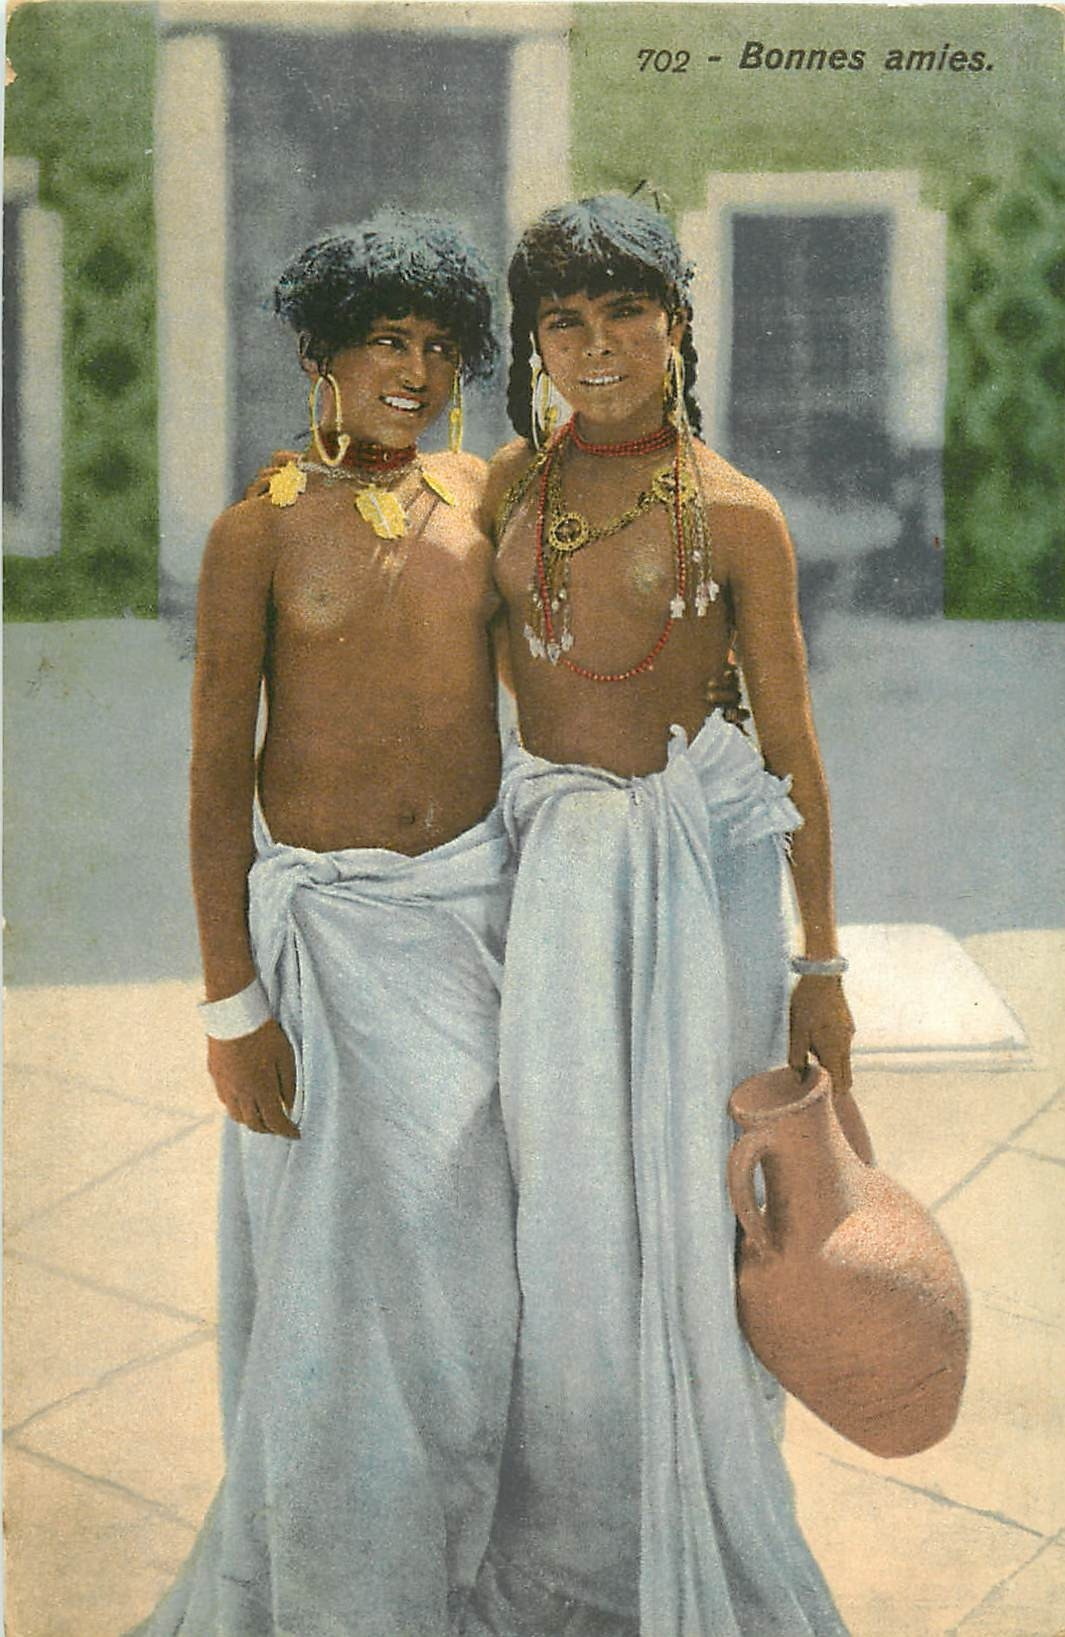 WW TUNISIE. Deux bonnes amies aux seins nus 1916